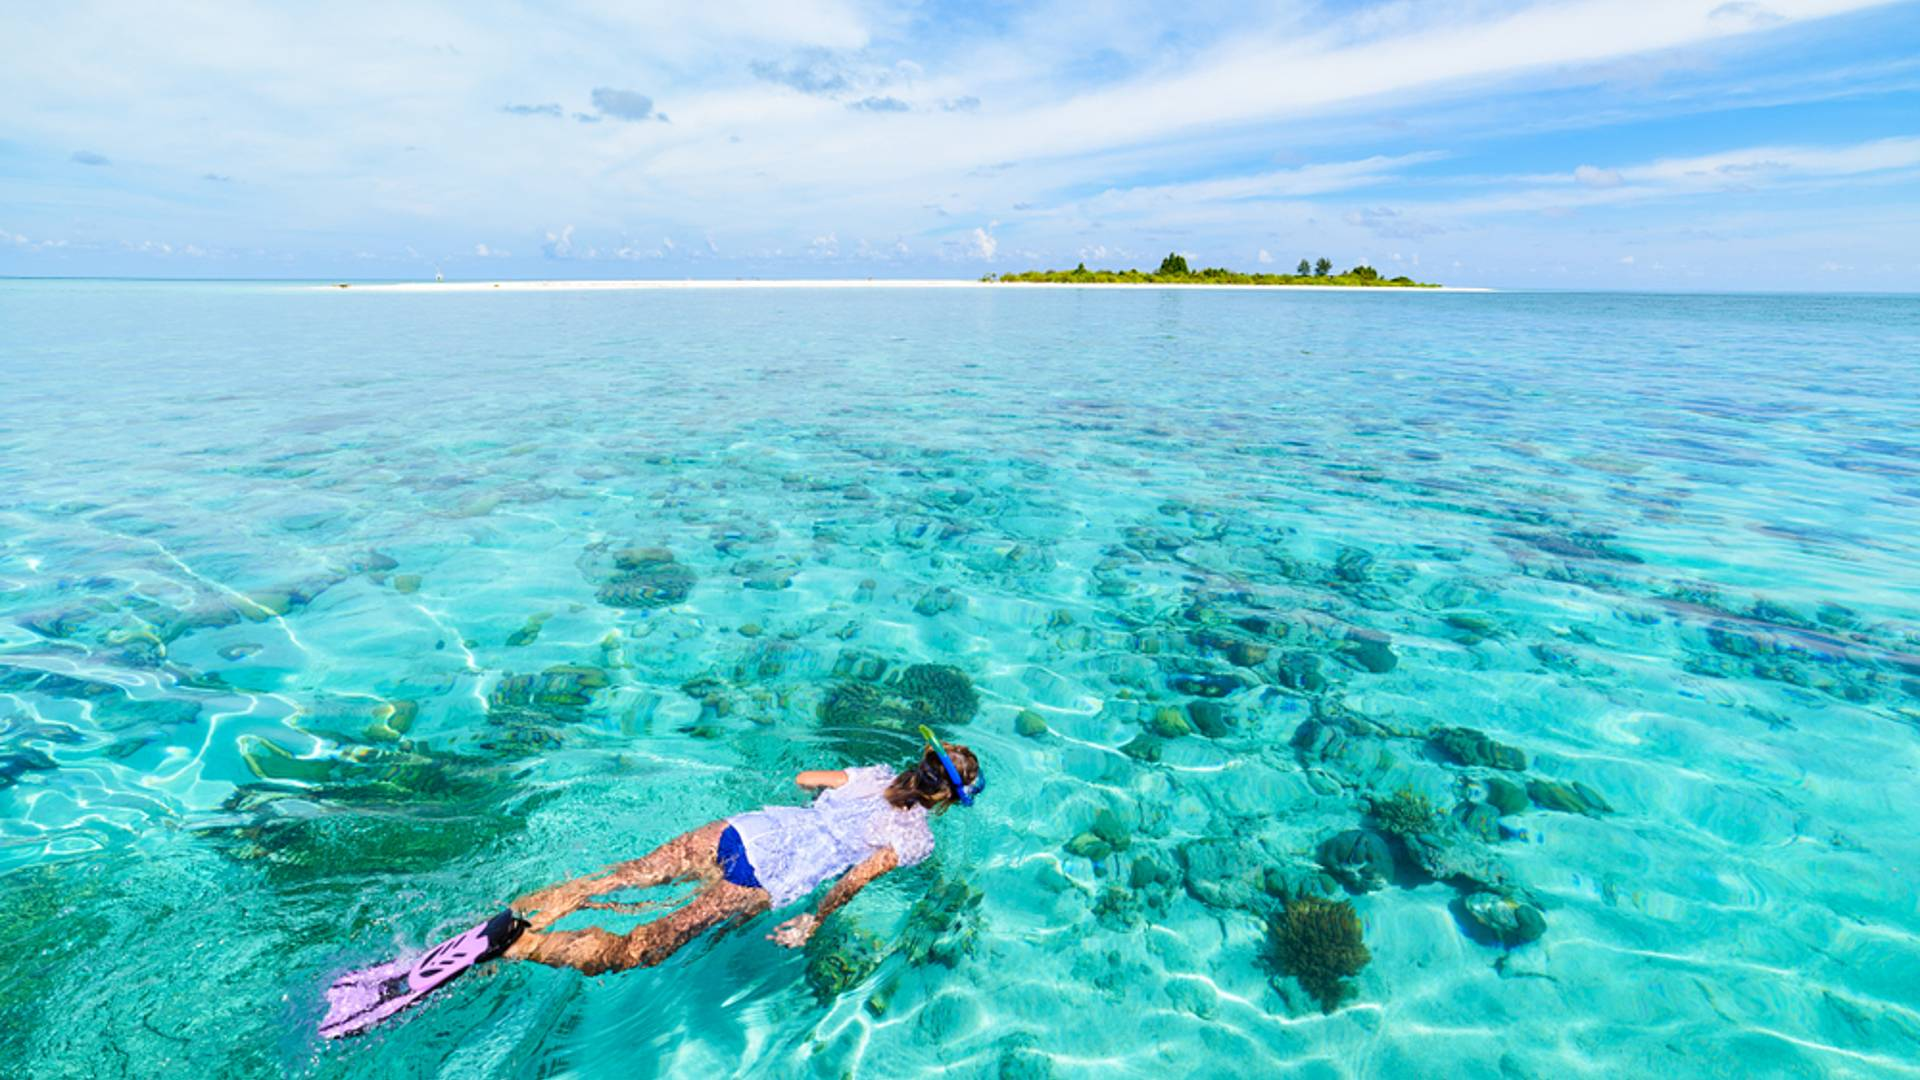 Aventure sur Sulawesi et l'archipel reculé de Wakatobi